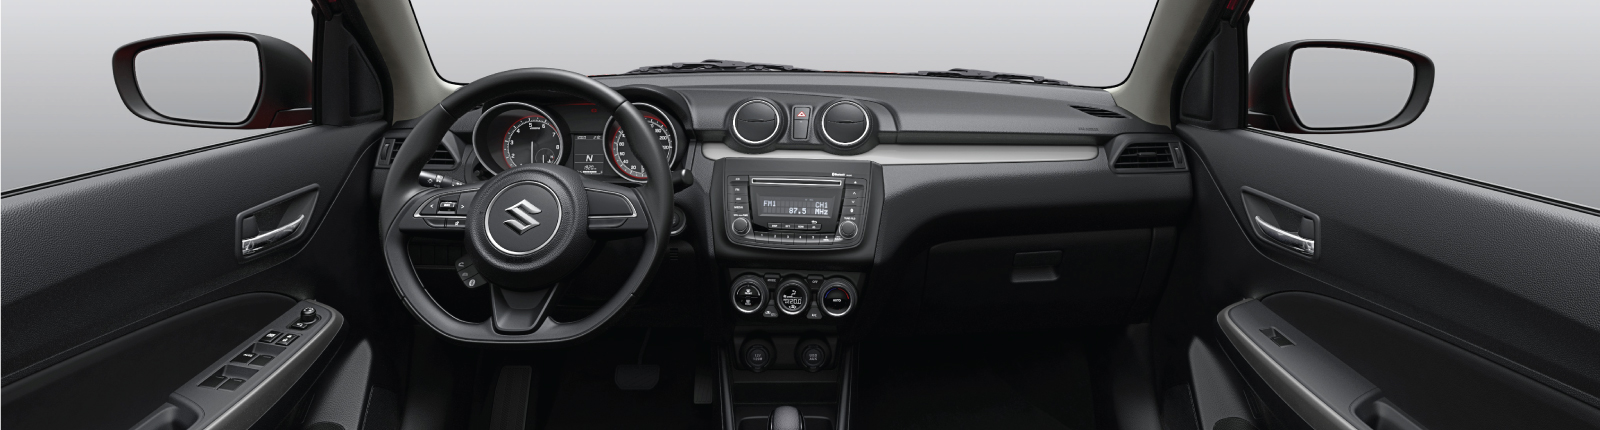 Suzuki bahrain car